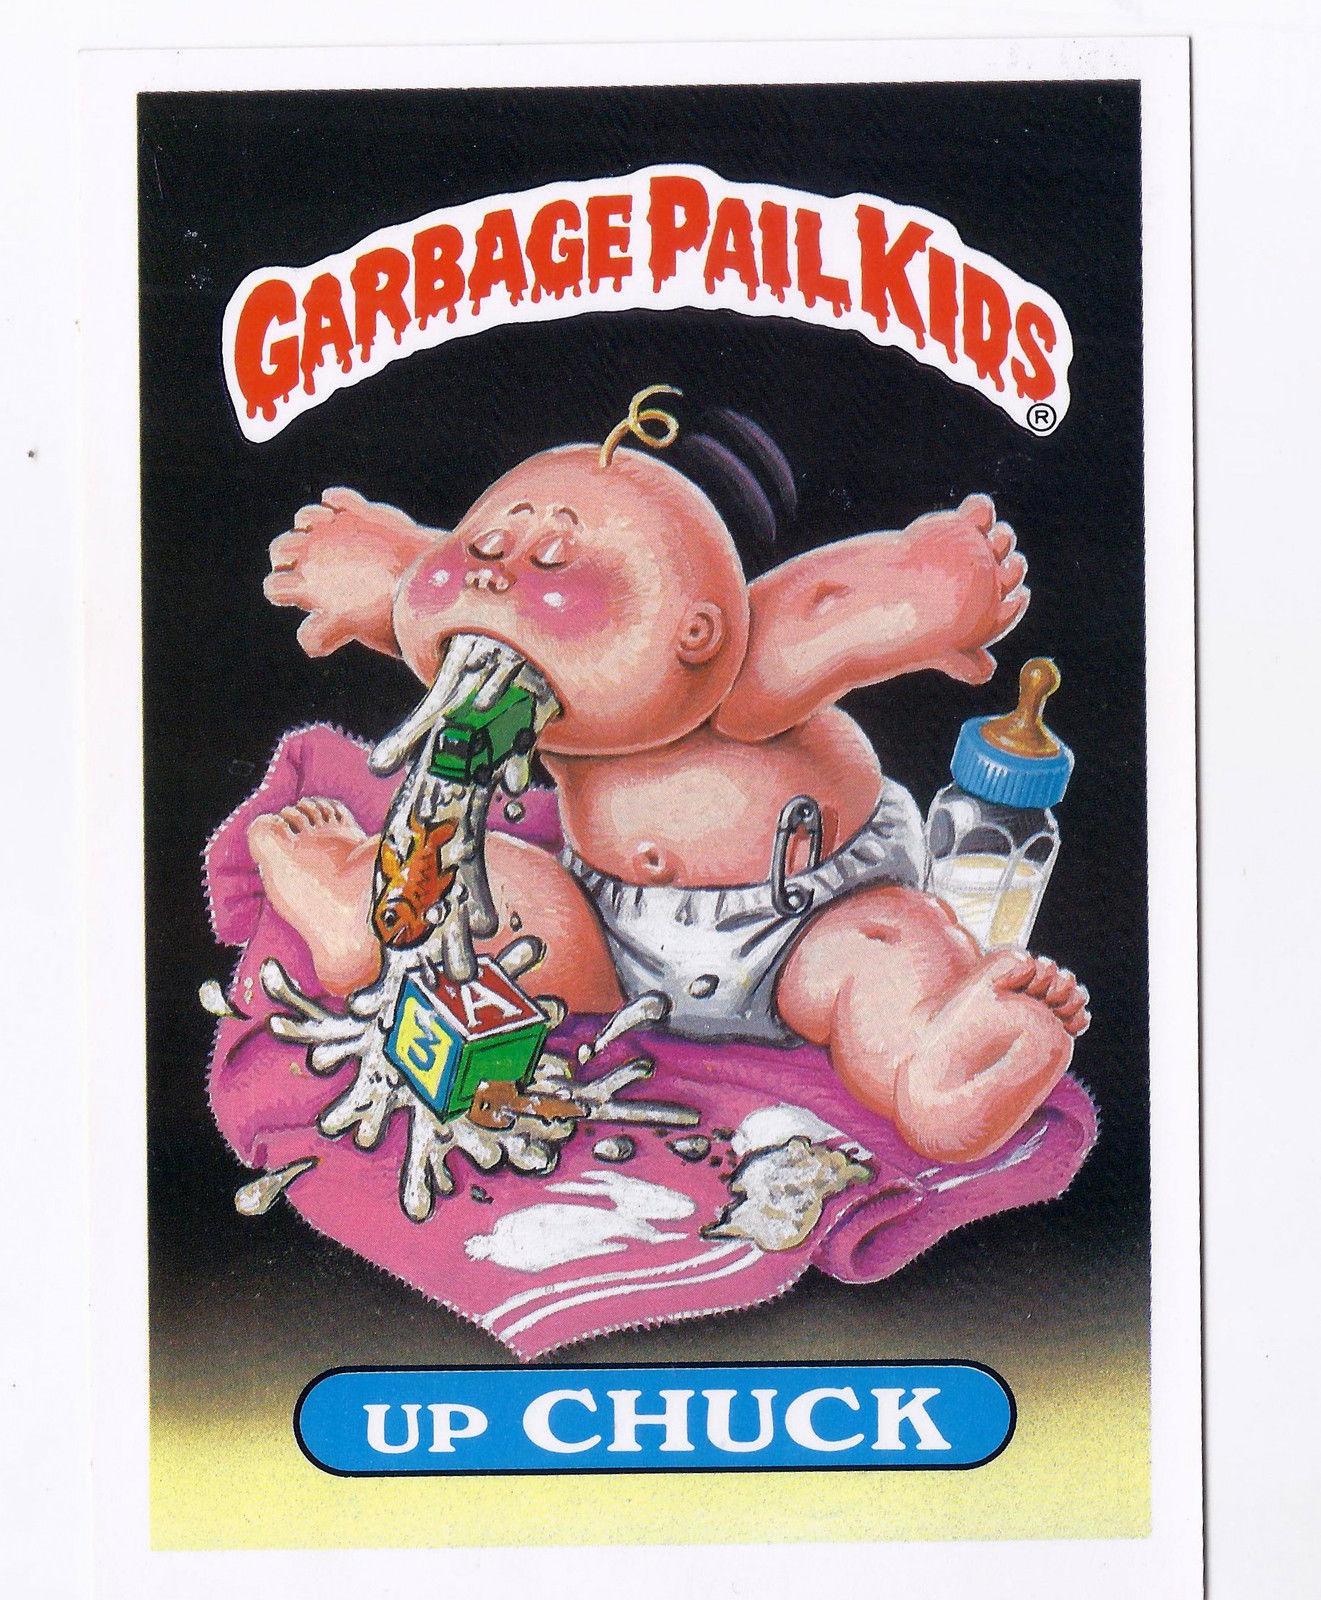 Garbage Pail Kids Giant Size Cards Lot #5 1986 Originals